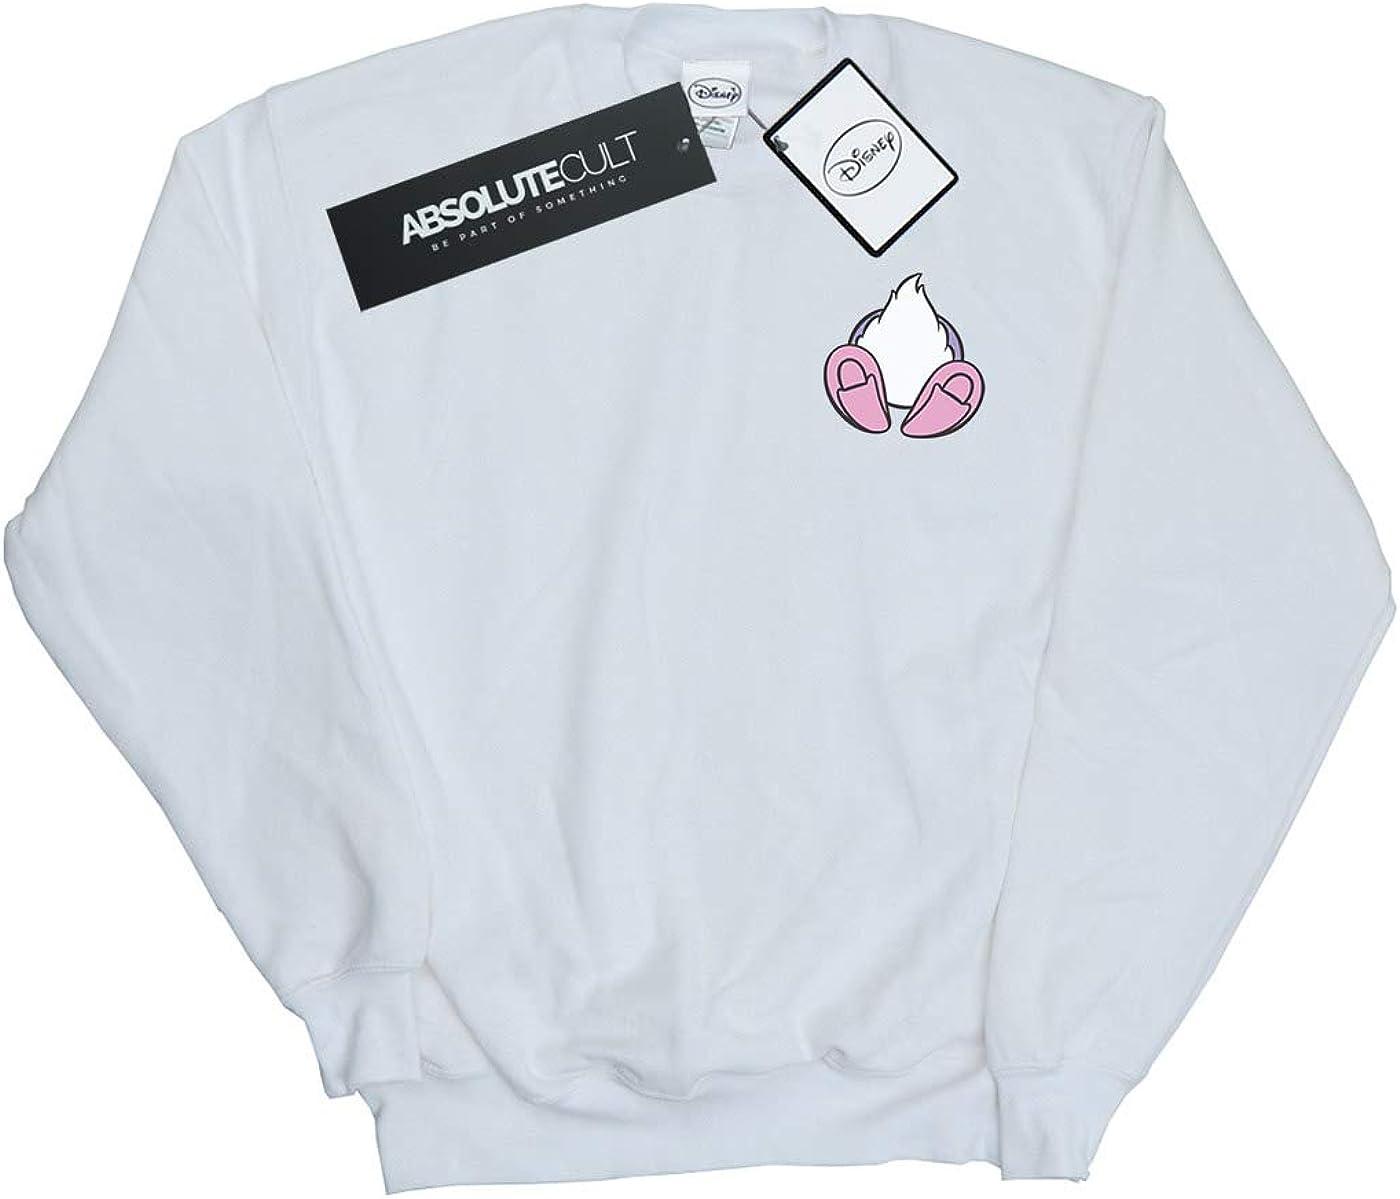 Disney Girls Daisy Duck Backside Breast Print Sweatshirt